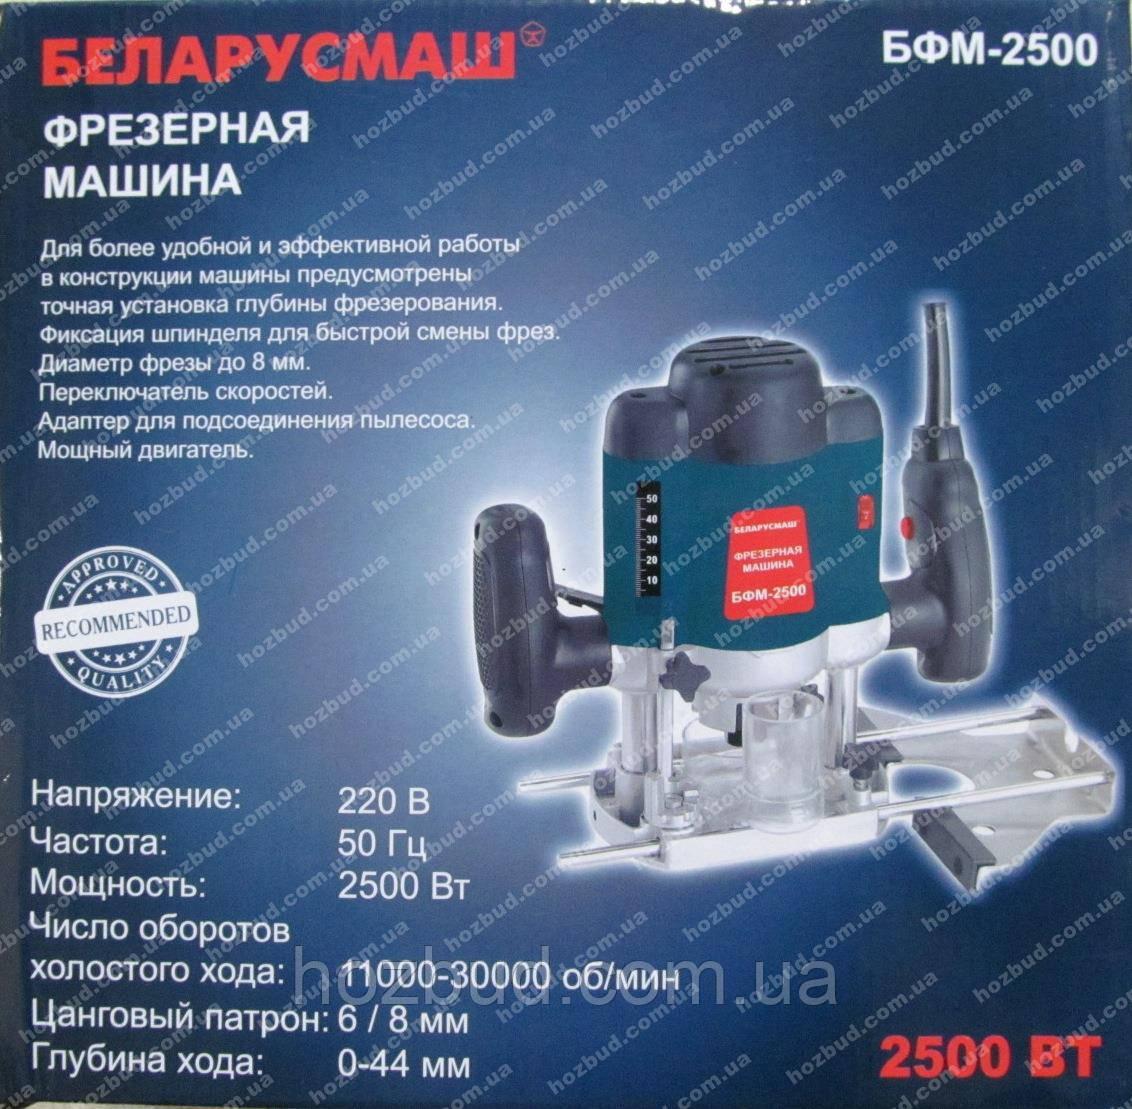 Фрезер Беларусмаш БФМ-2500